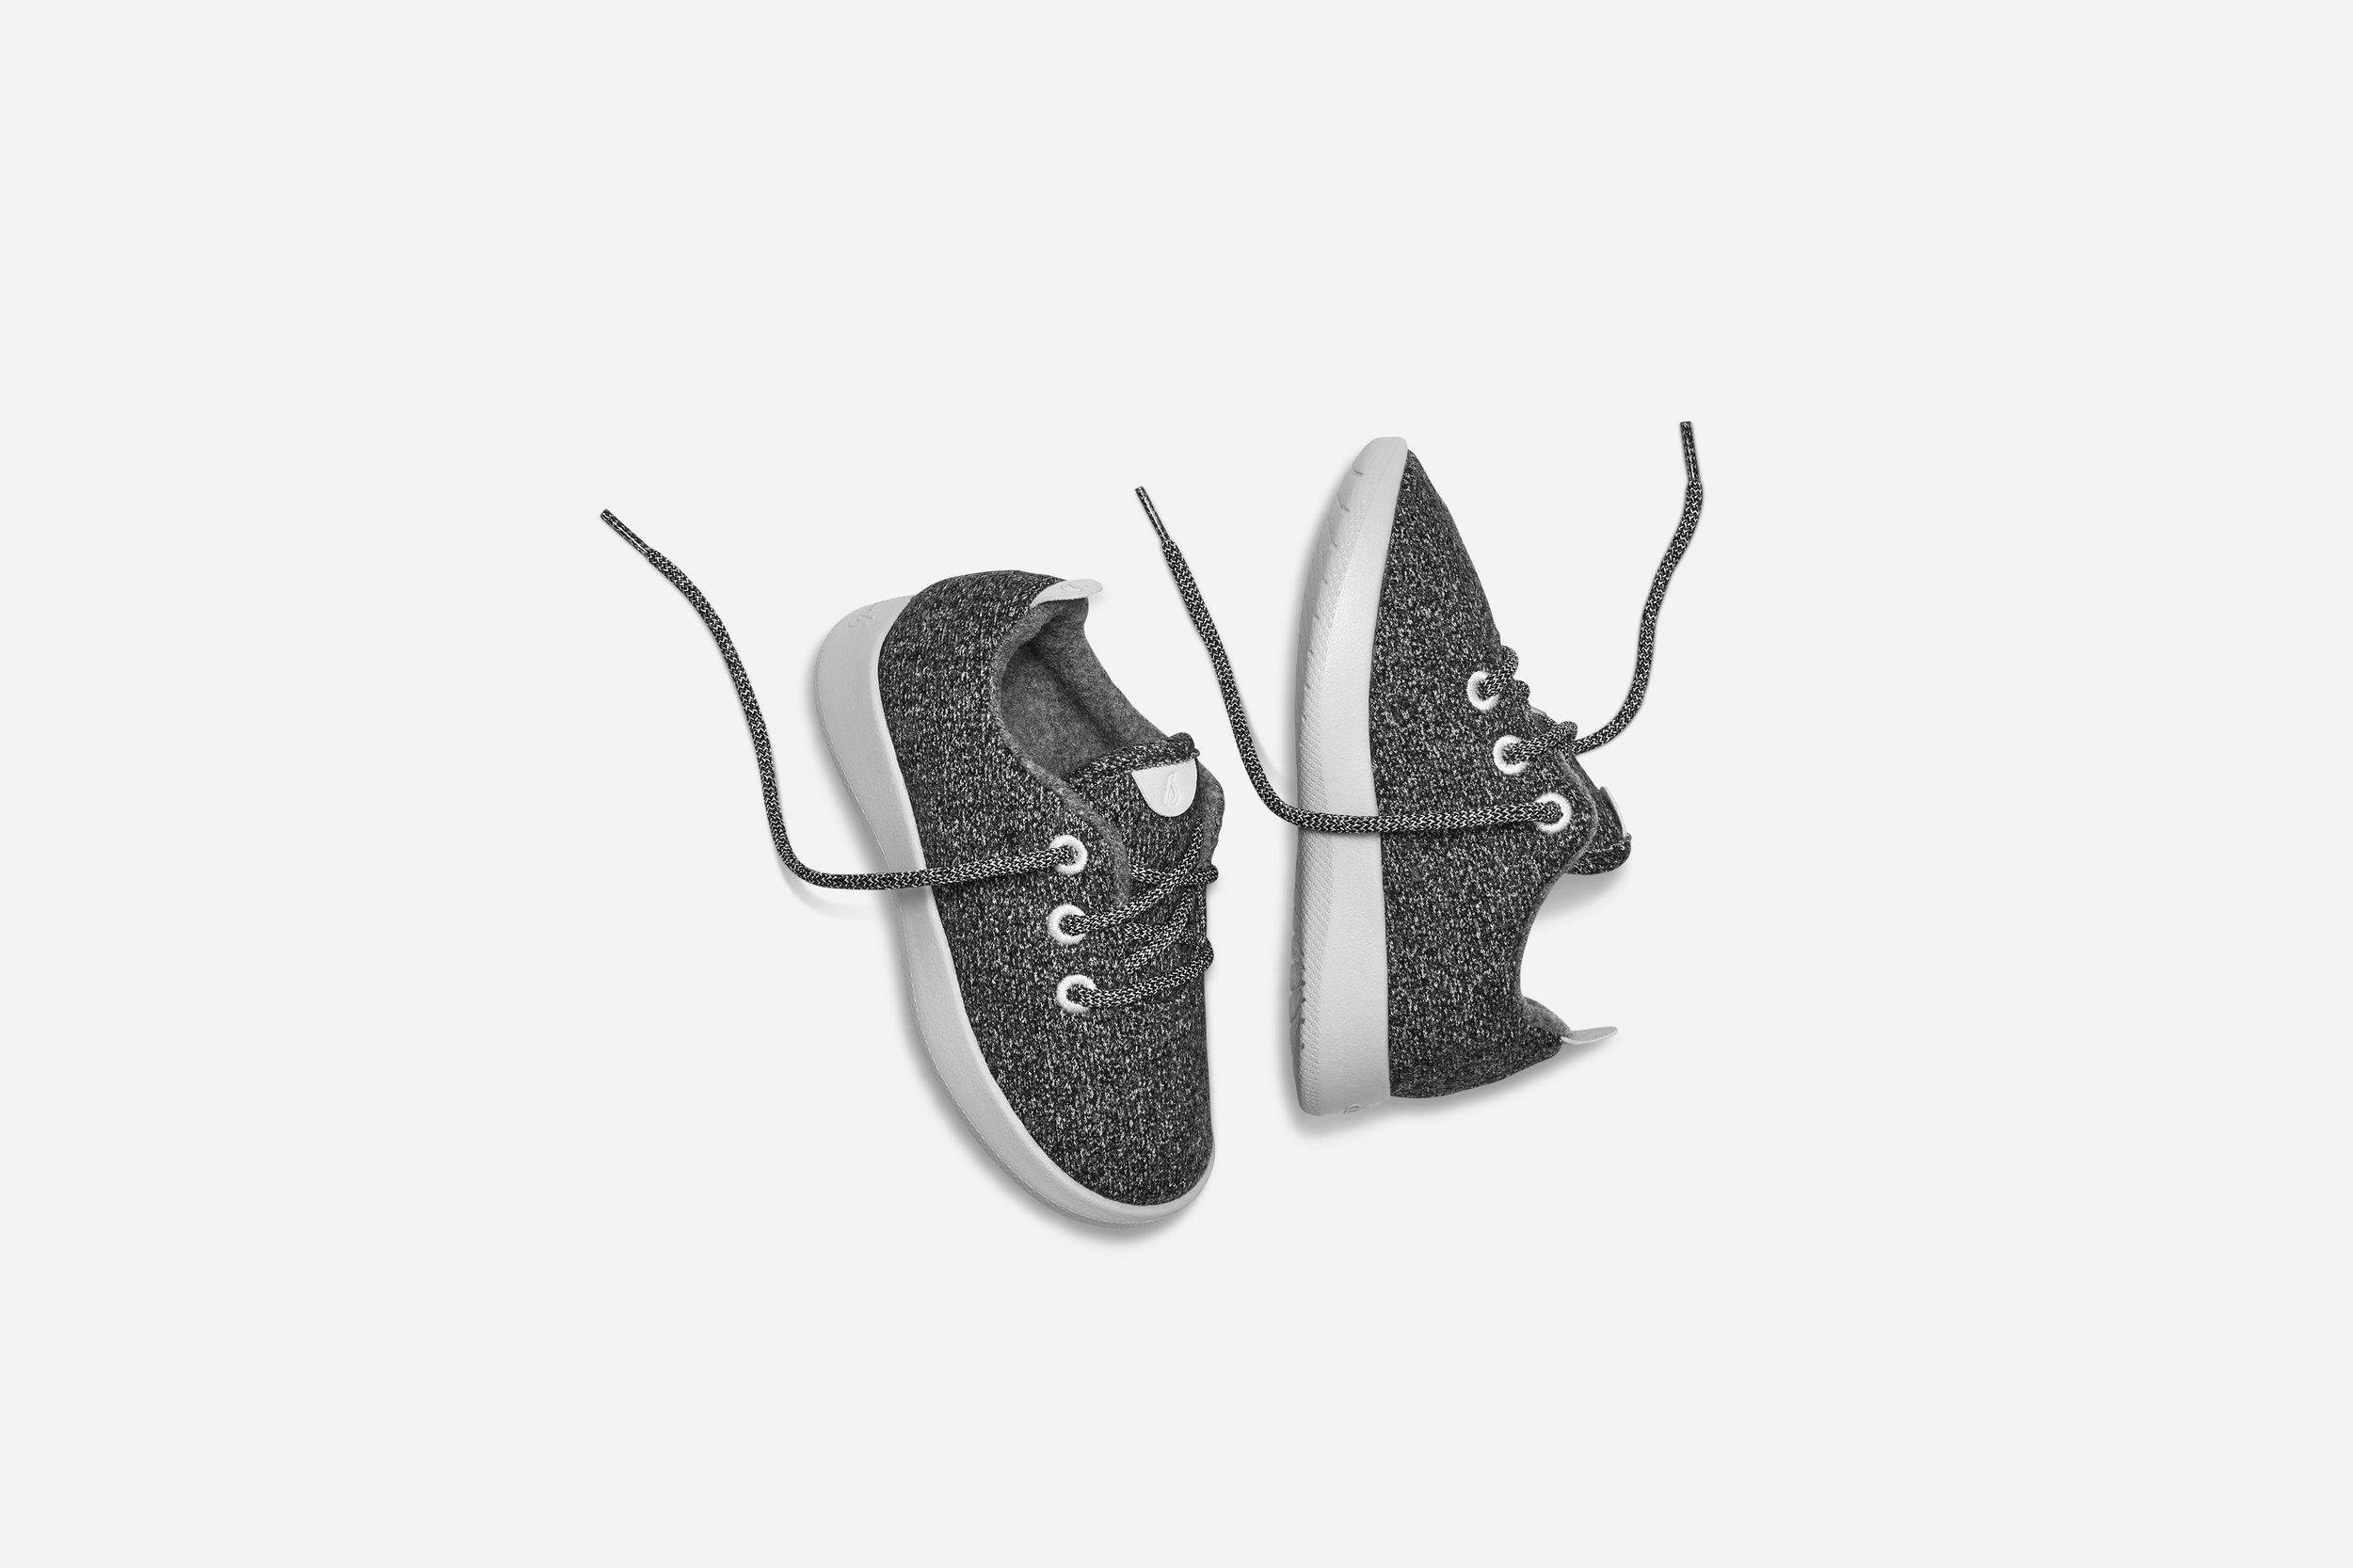 Smallbirds+pair+of+shoes.jpg